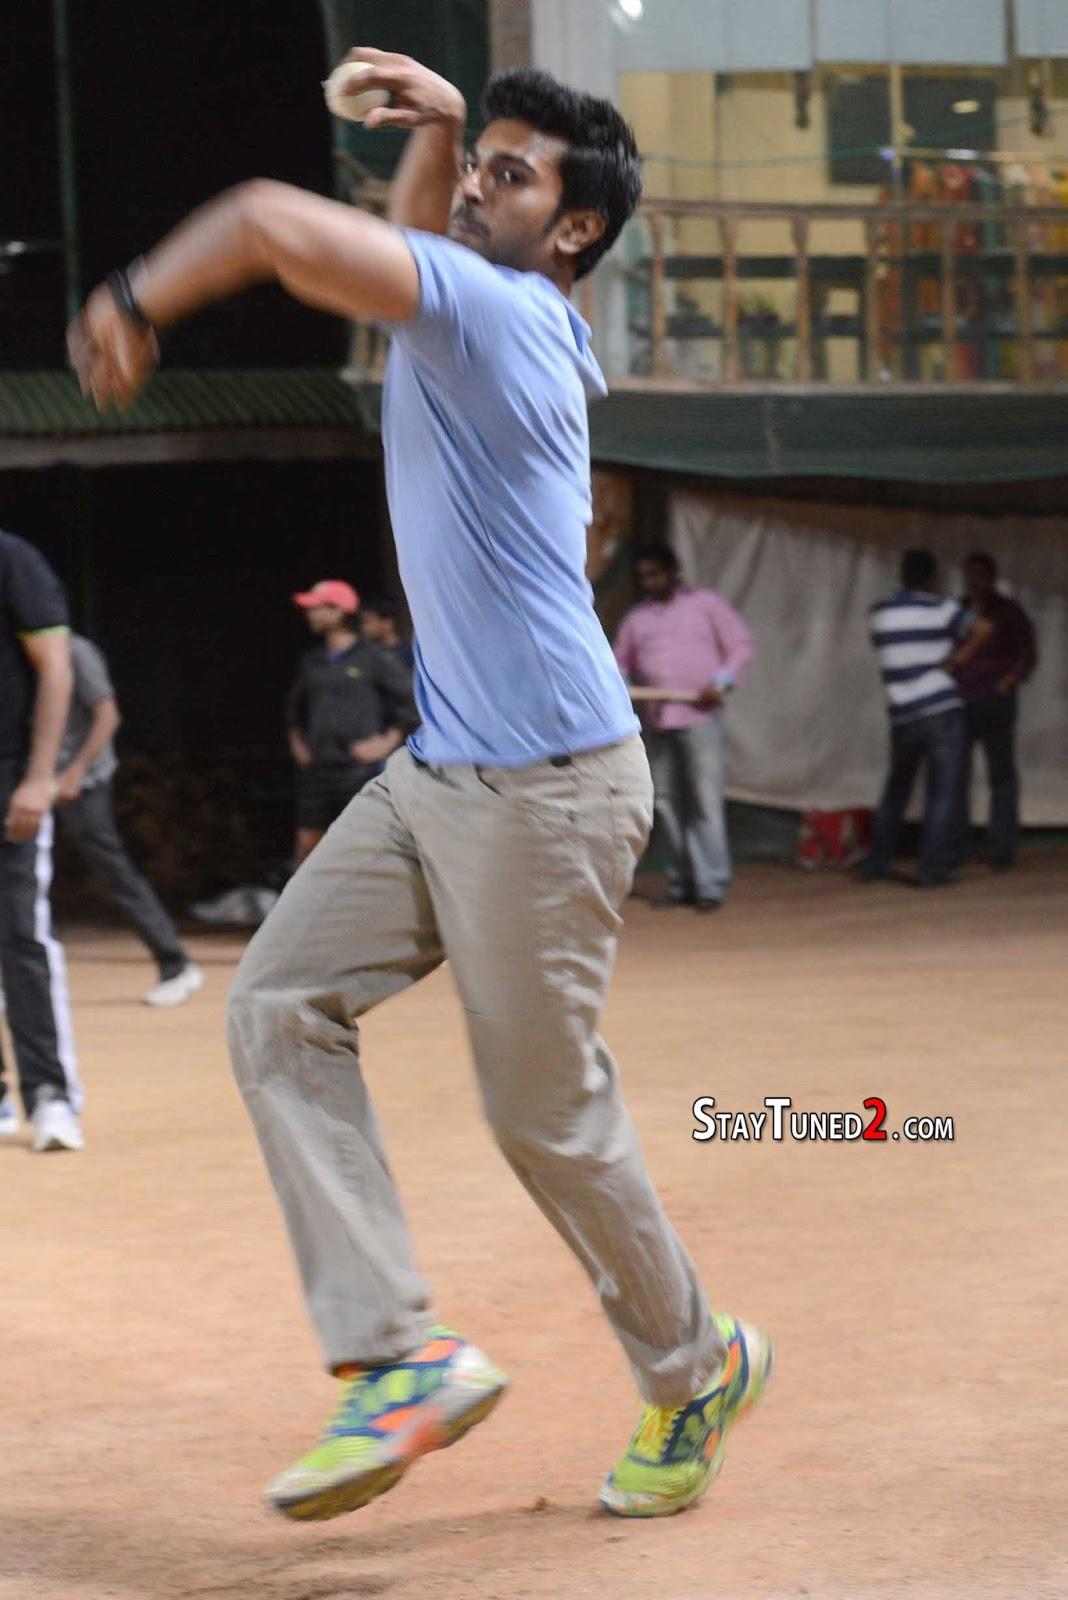 http://1.bp.blogspot.com/-Ic3EqFee8Mw/URNNejGONXI/AAAAAAAAFR0/MR937ZT7fBc/s1600/Telugu-Warriors-Practicing-For-CCL-3-At-In-Sportz-Stadium-34.jpg